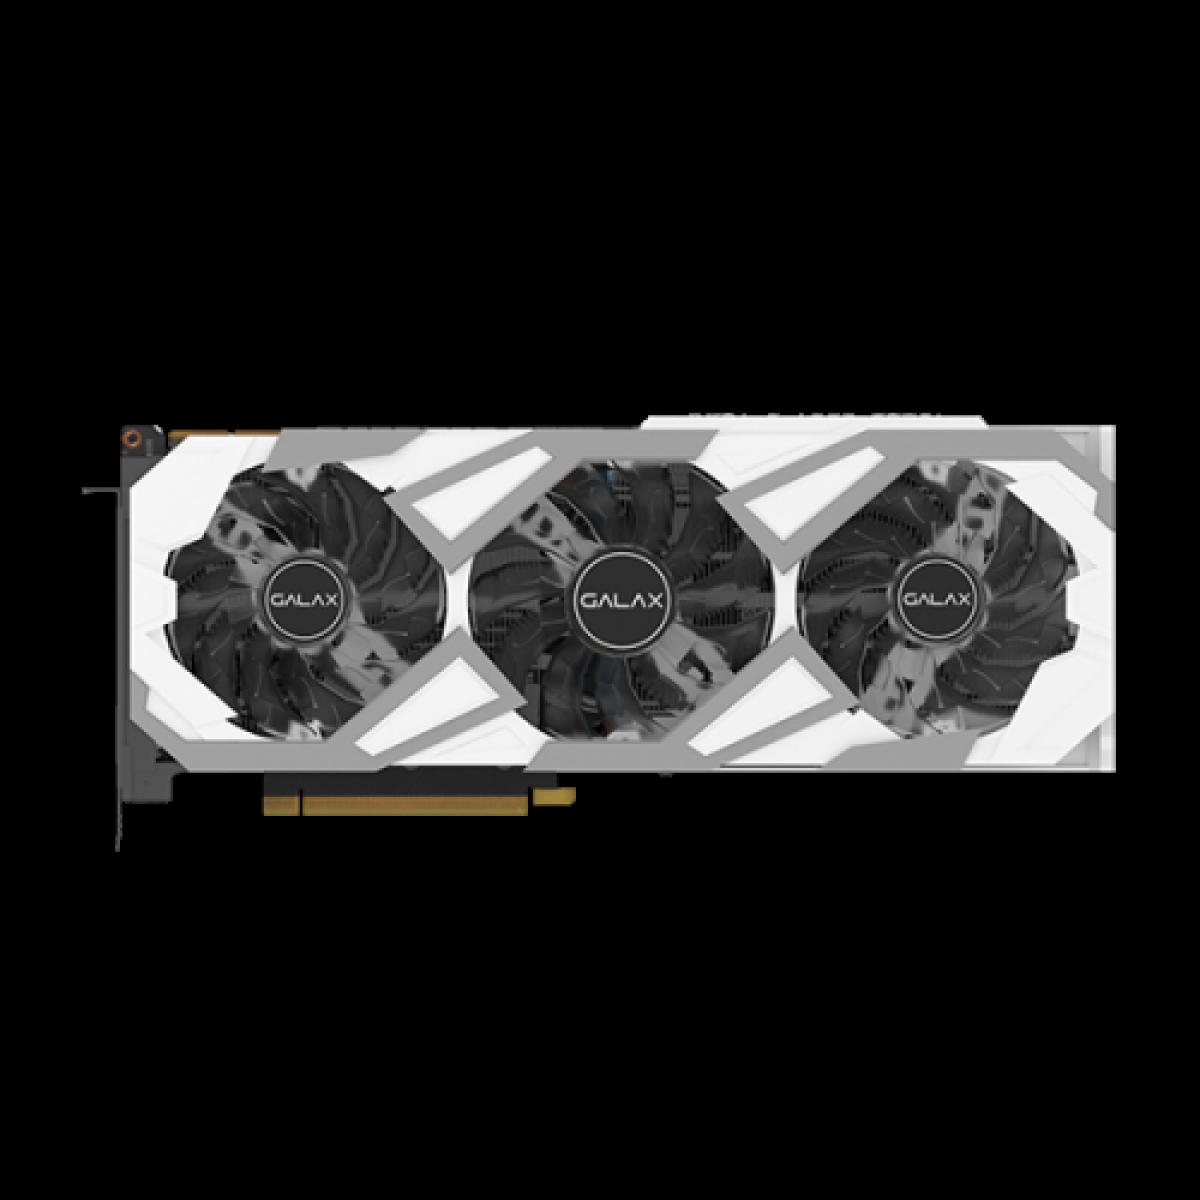 Placa de Vídeo Galax, GeForce, RTX 3090 EX Gaming White, 1 Click OC, 24GB, GDDR6X, 384Bit,